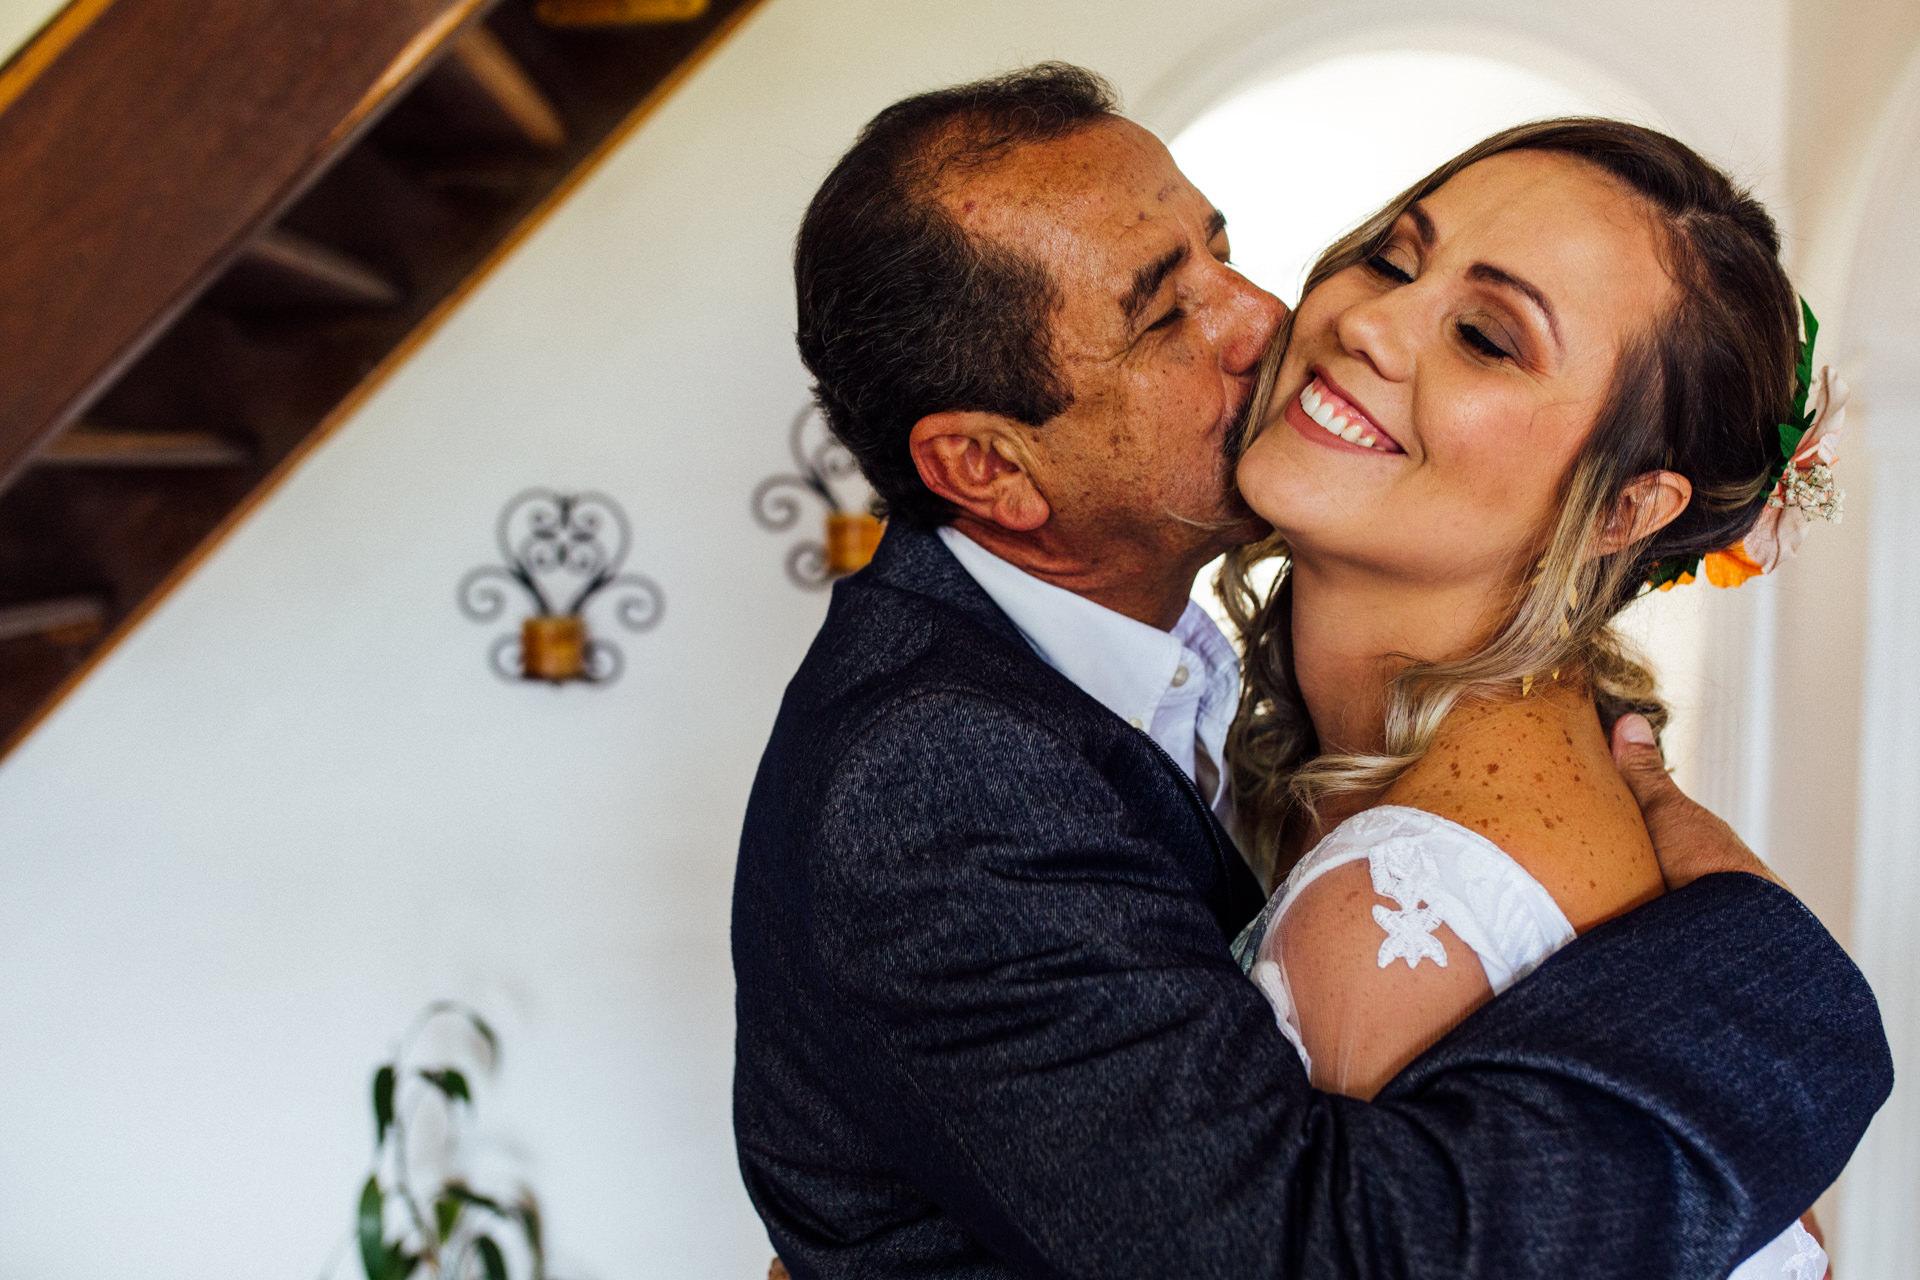 Wedding-Boda-Matrimonio-Fotografo-Fotografia-bodas-Medellin-Llanogrande-Colombia-Bogota-Cartagena-Miami-Wed-Destination-Photojournalism (58).JPG